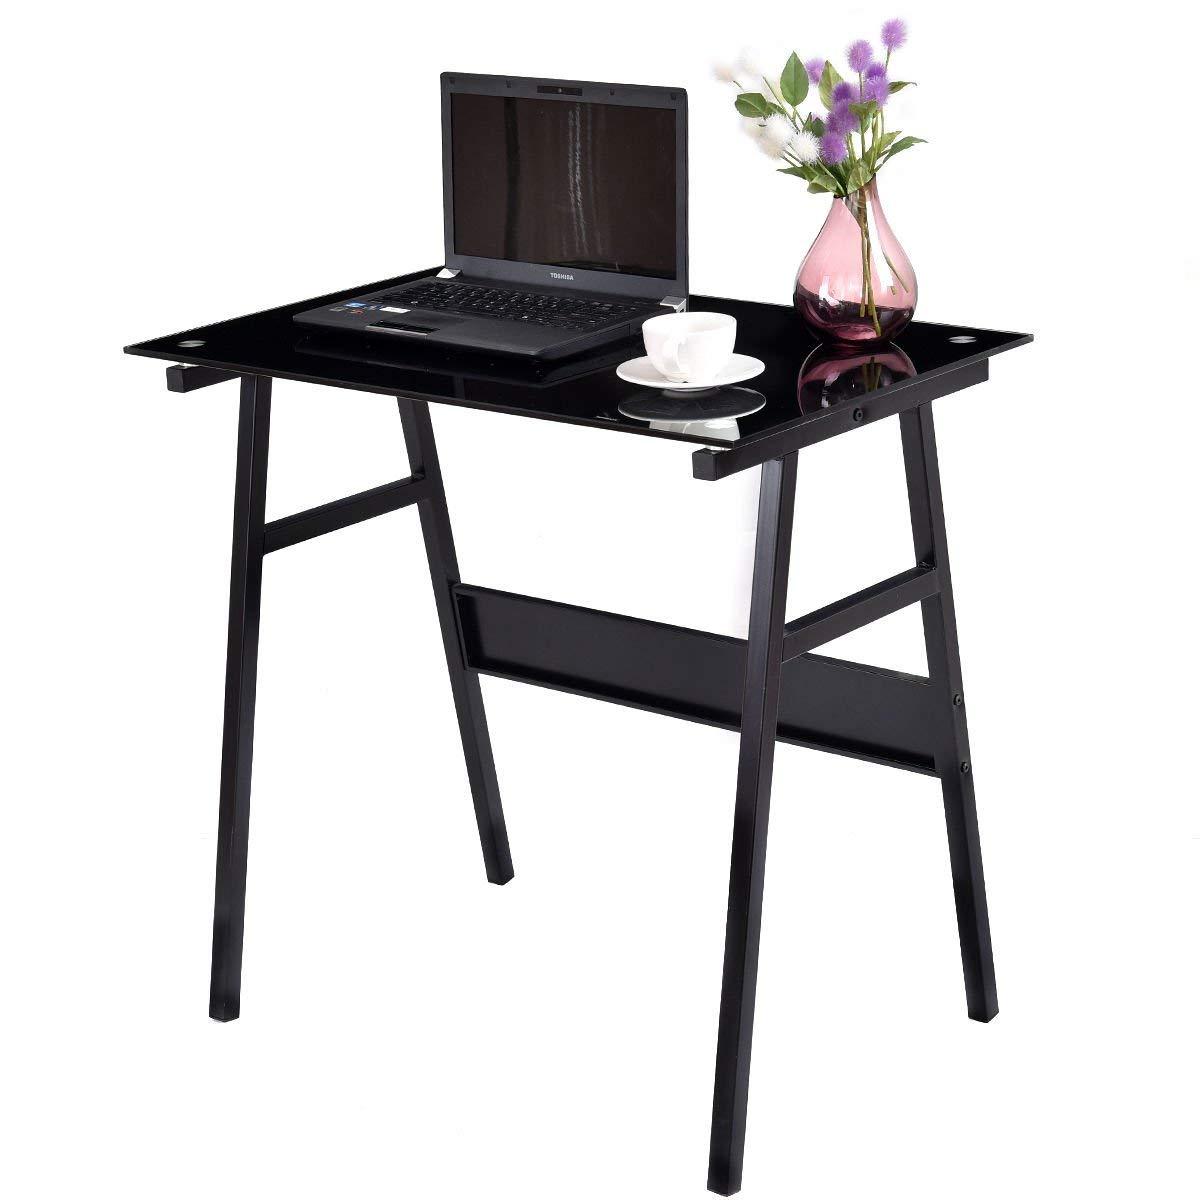 Black Computer Desk Writing Table Glass Top Metal Leg Study Decor Home Office